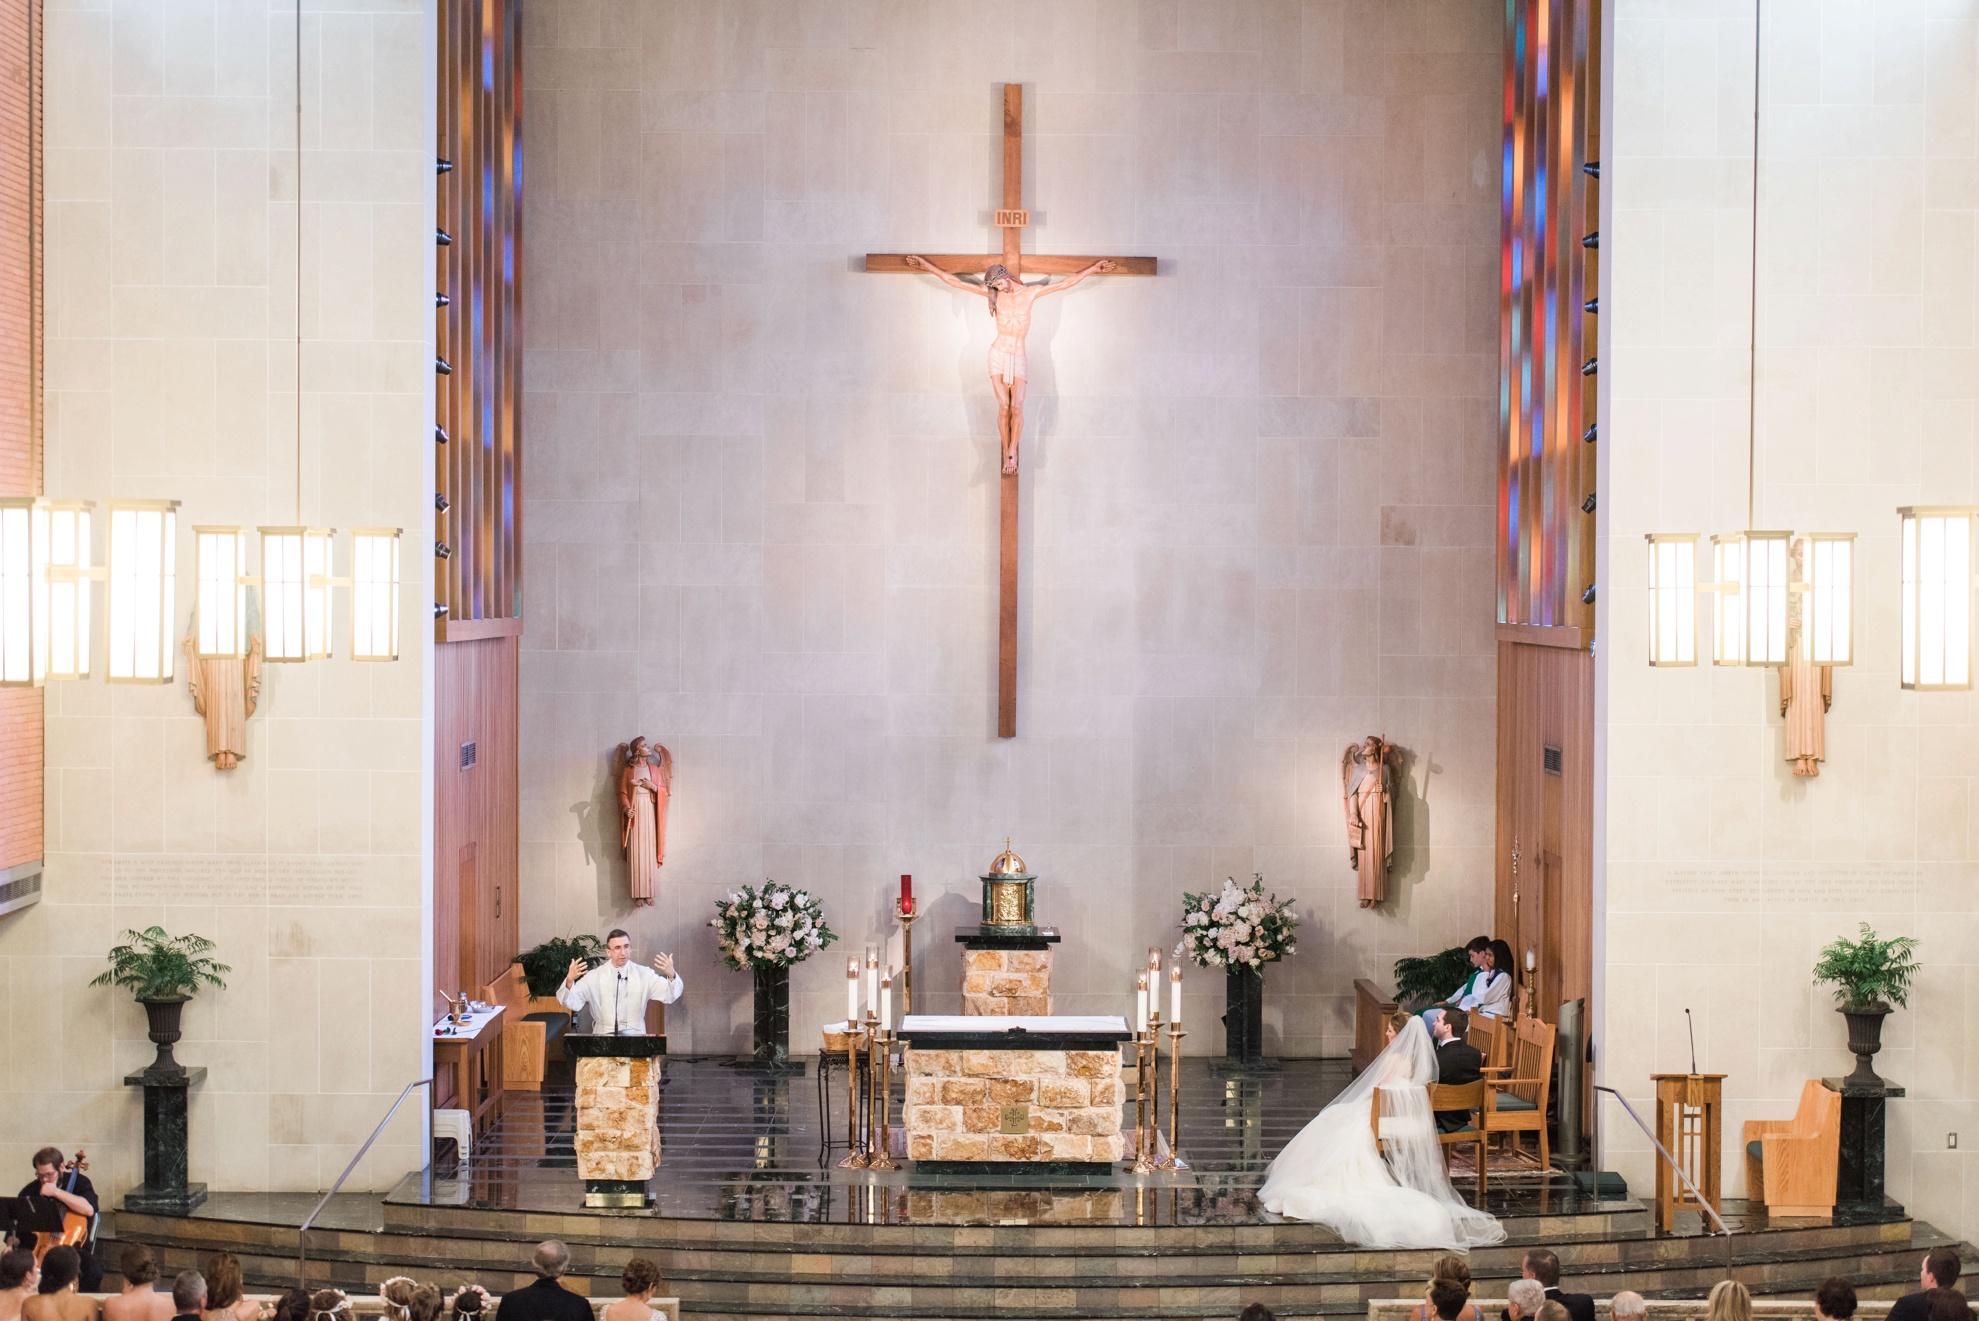 St.-Vincent-De-Paul-Catholic-Church-Wedding-Ceremony-Photographer-Dana-Fernandez-Photography-2.jpg